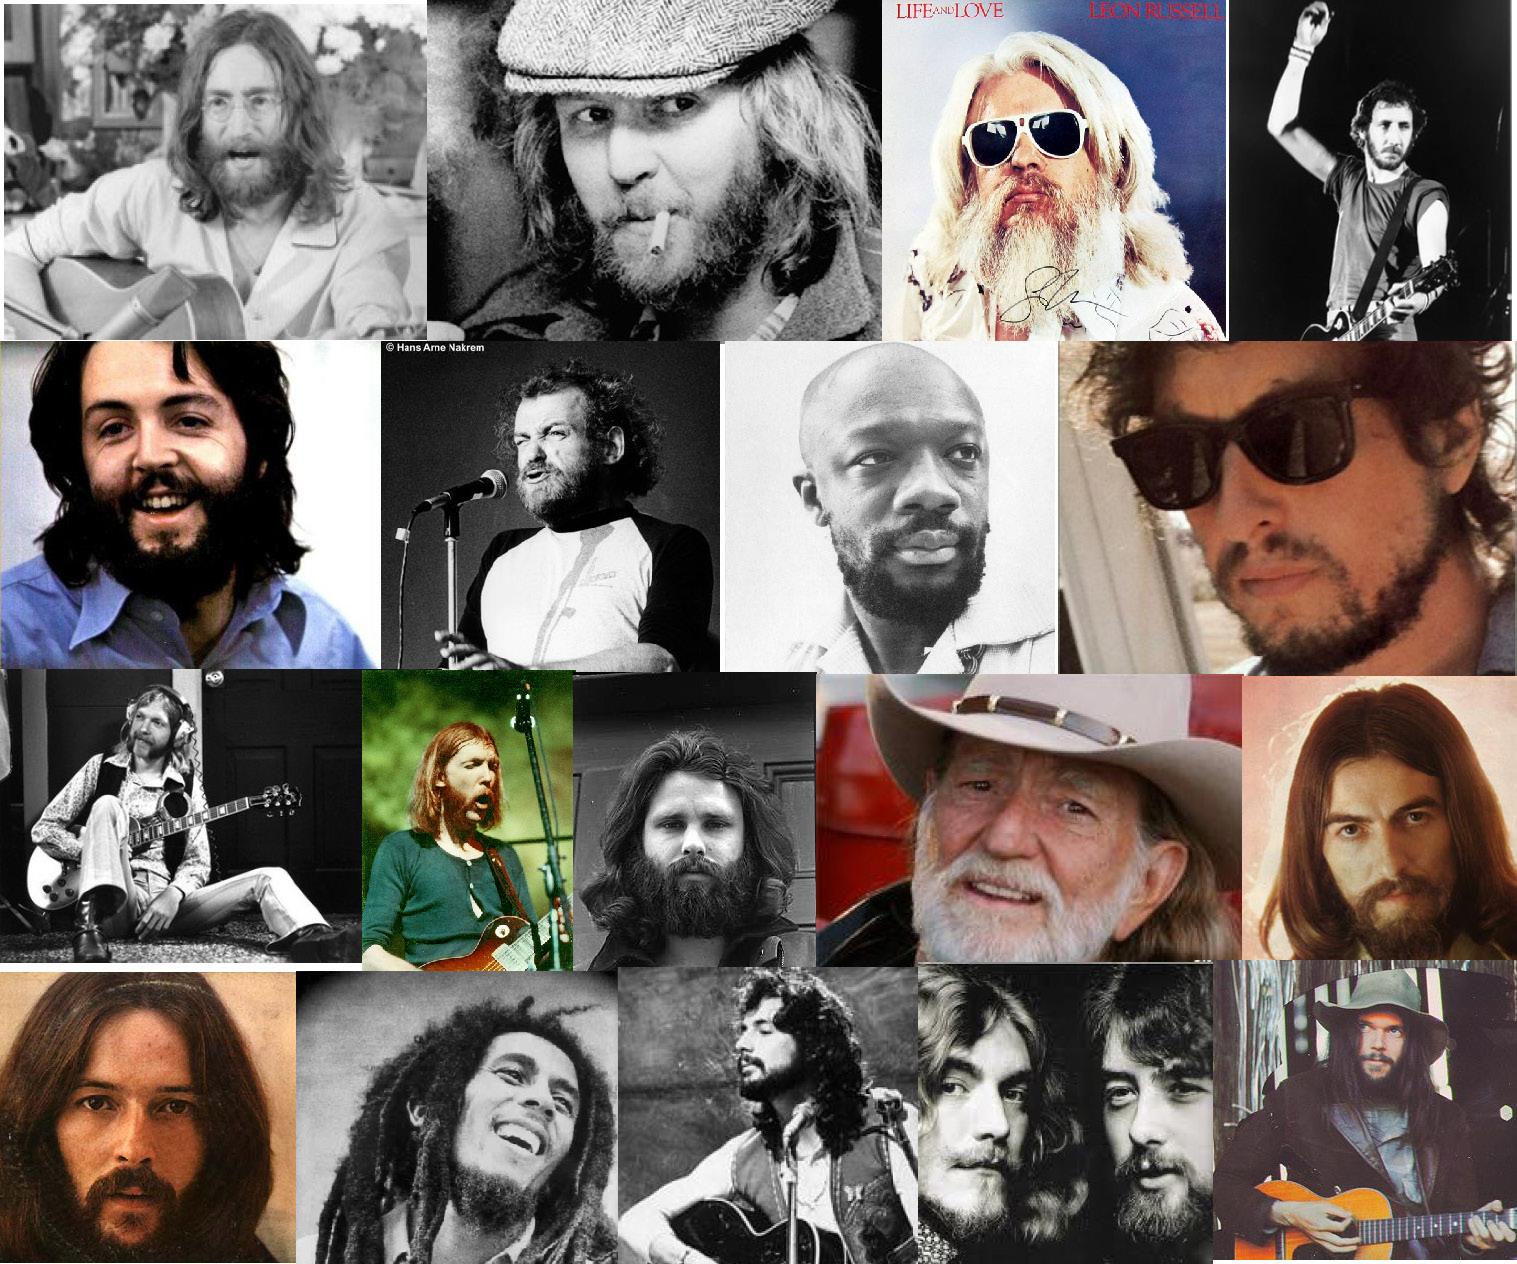 http://2.bp.blogspot.com/_BRl9eMfBcZk/TQjhjmqvjlI/AAAAAAAAAGk/SvdacShg7Bo/s1600/beardedmusicians.jpg